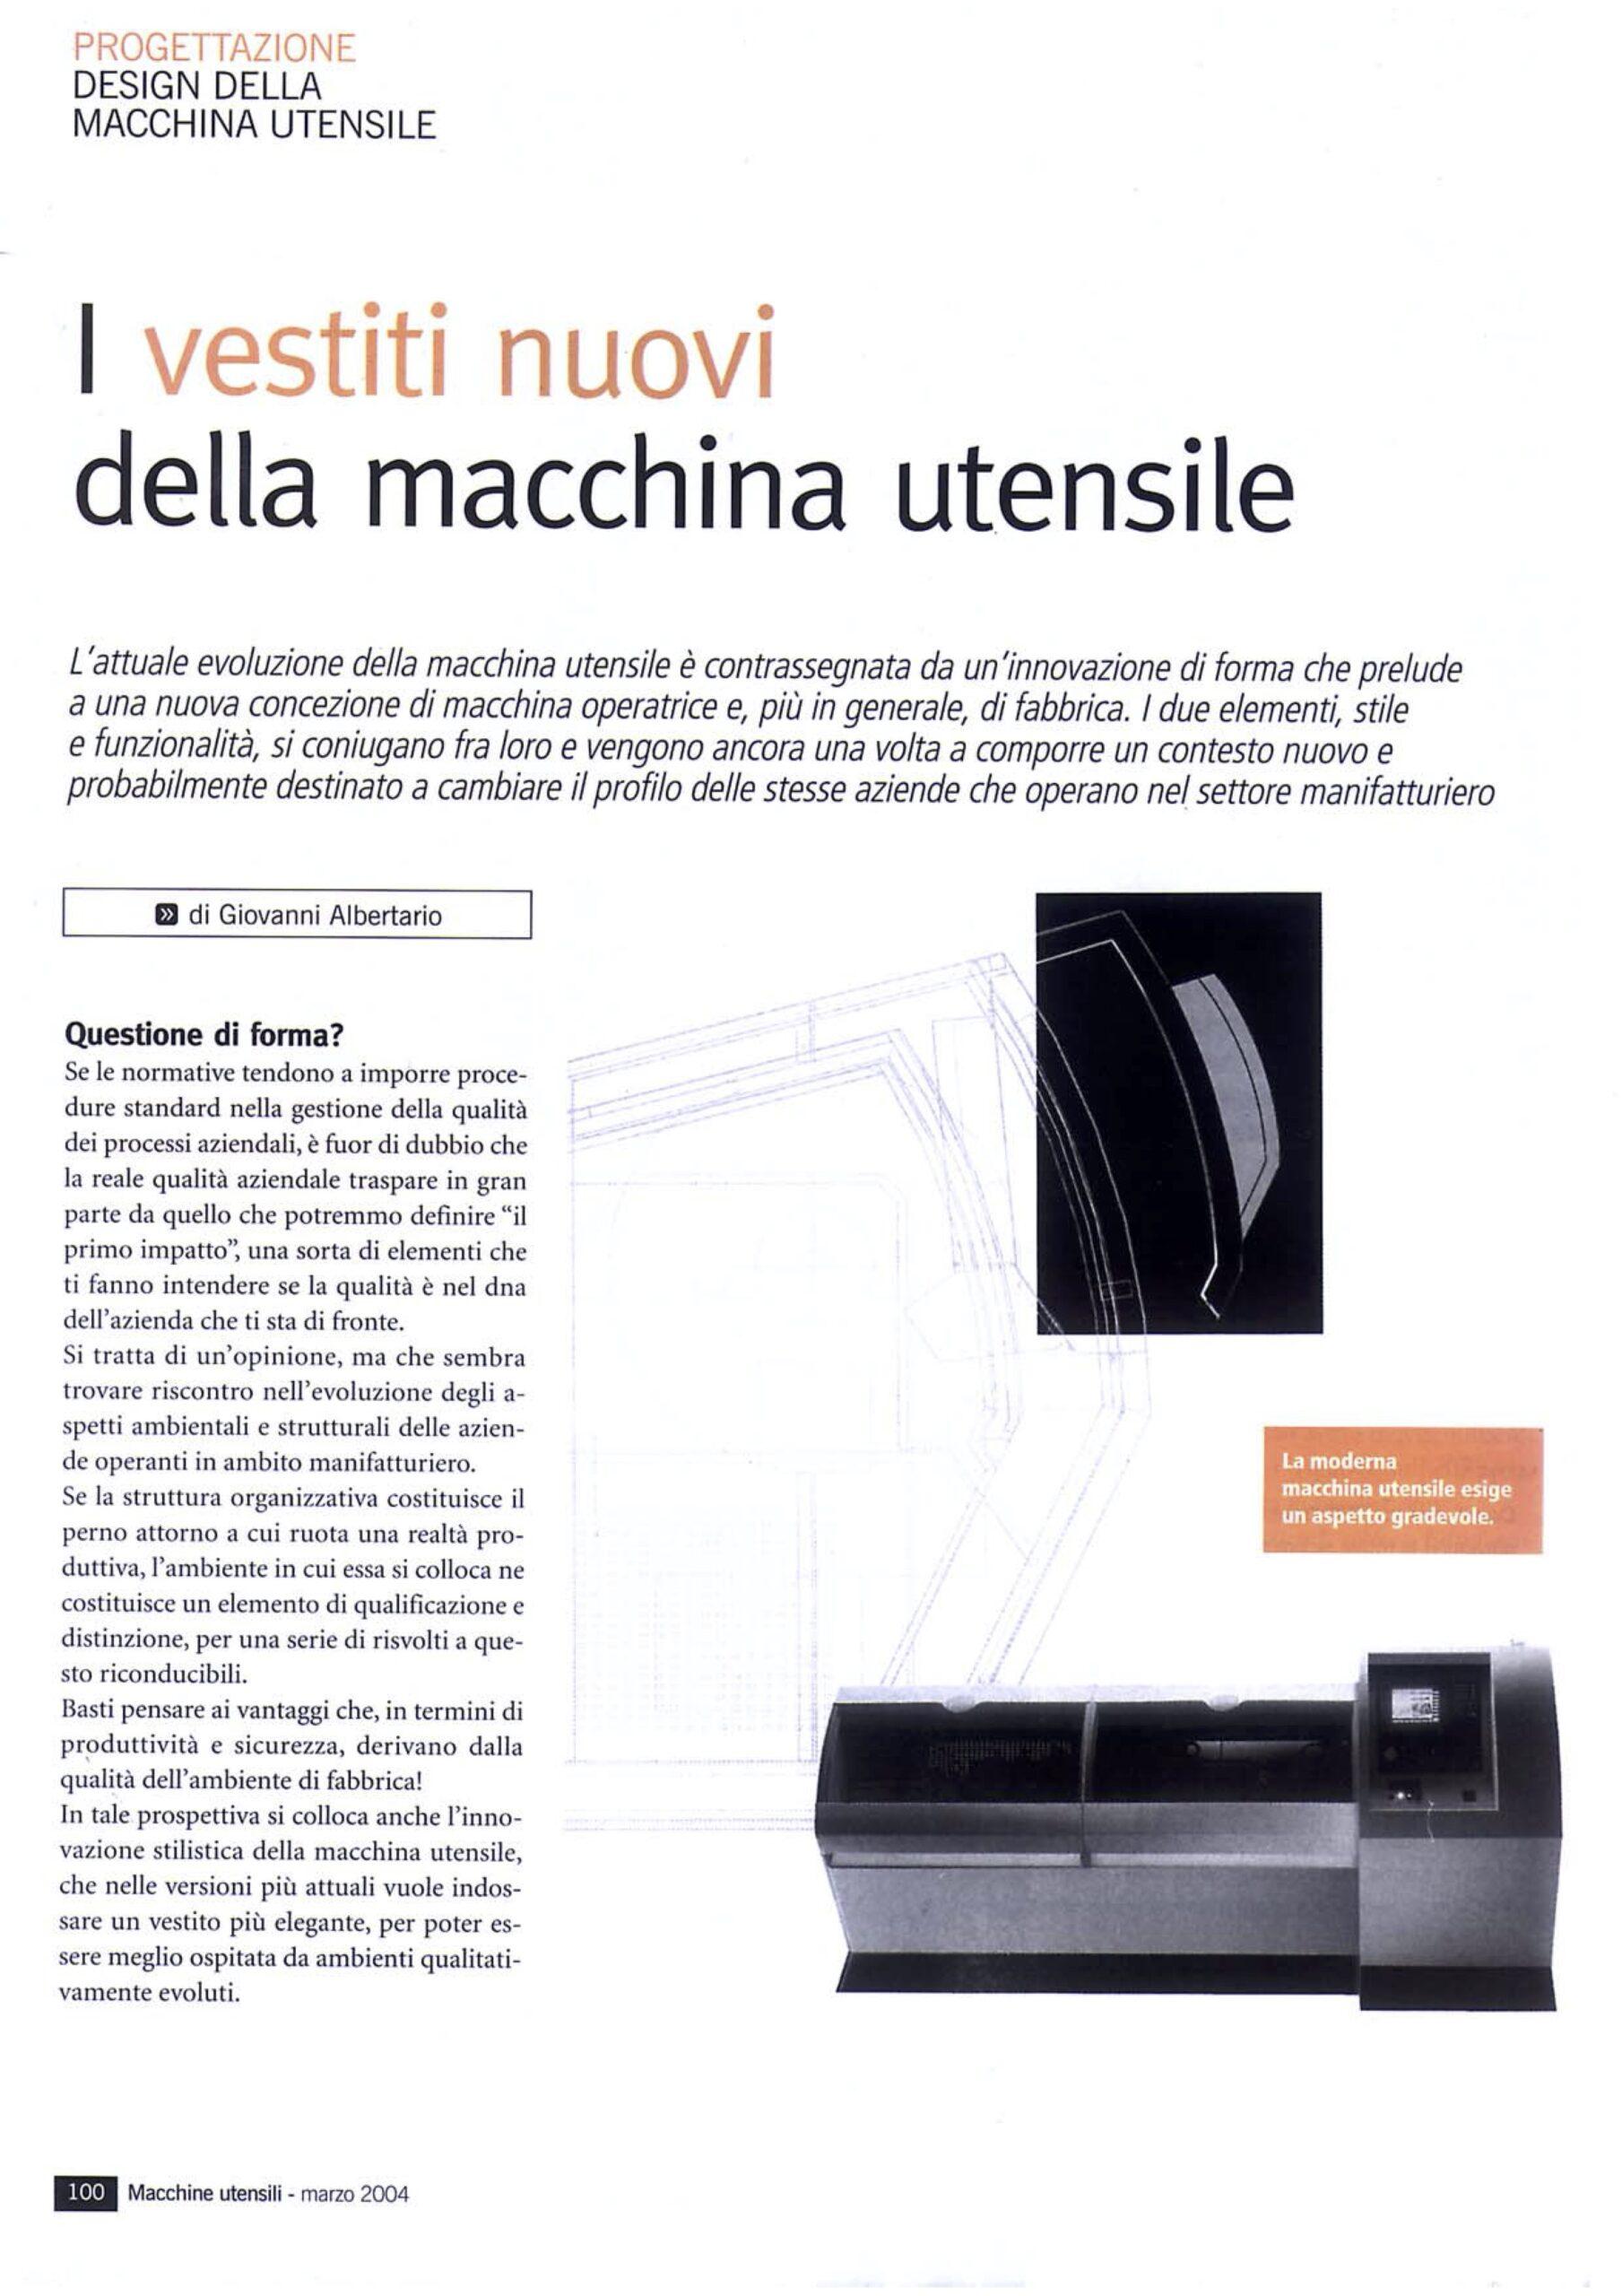 Macchine Utensili Maggio 2004 1